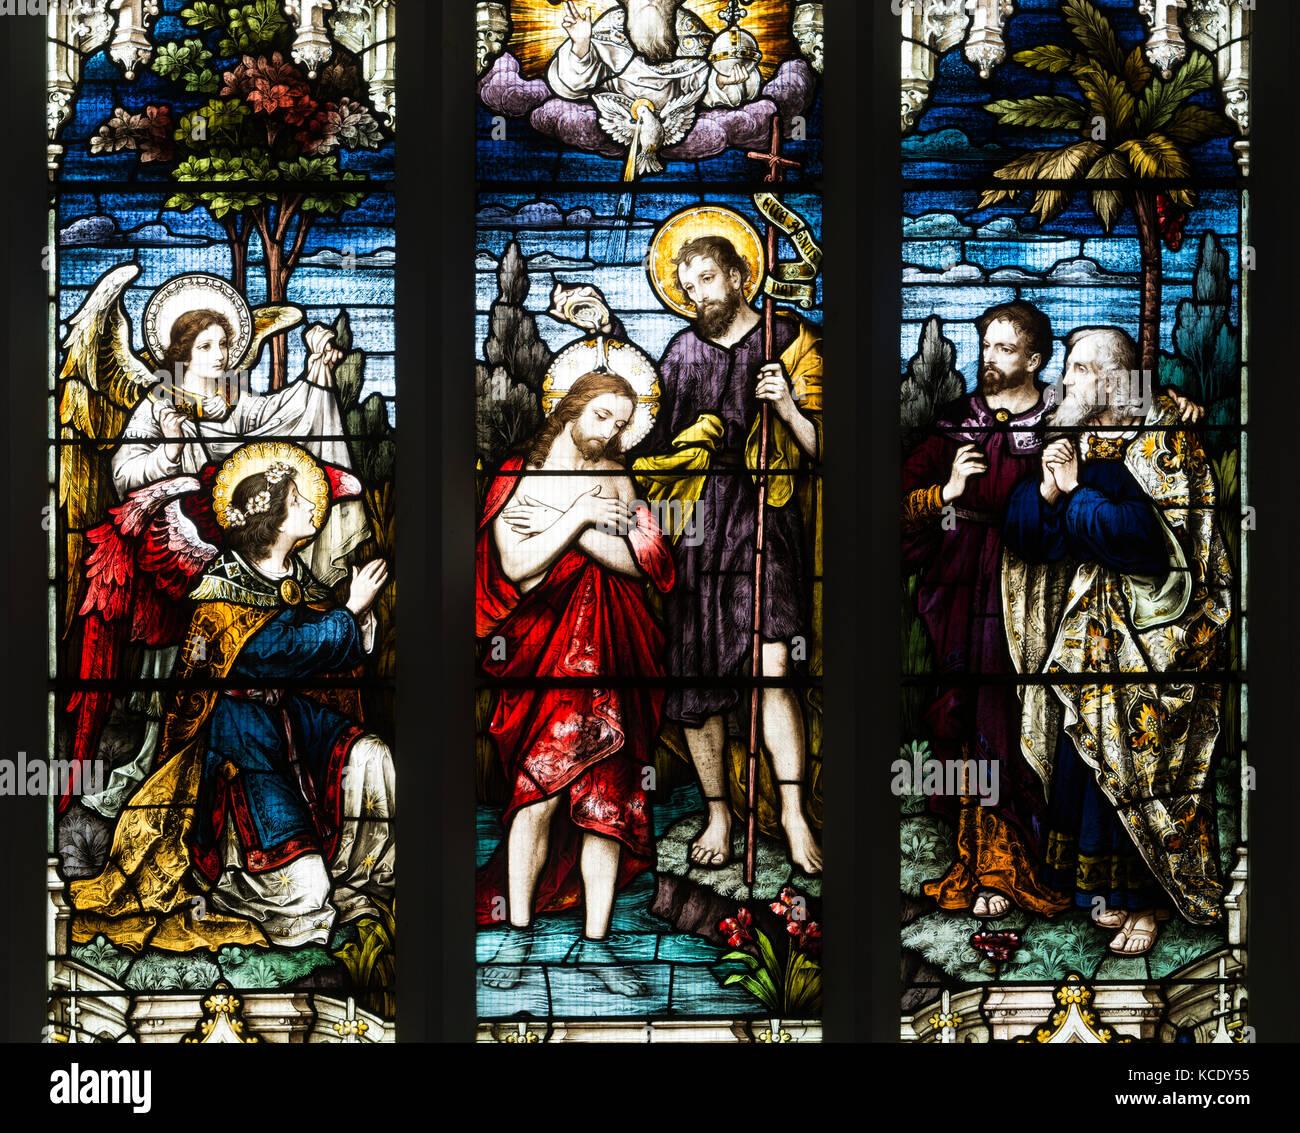 Baptism By John The Baptist Imágenes De Stock & Baptism By John The ...